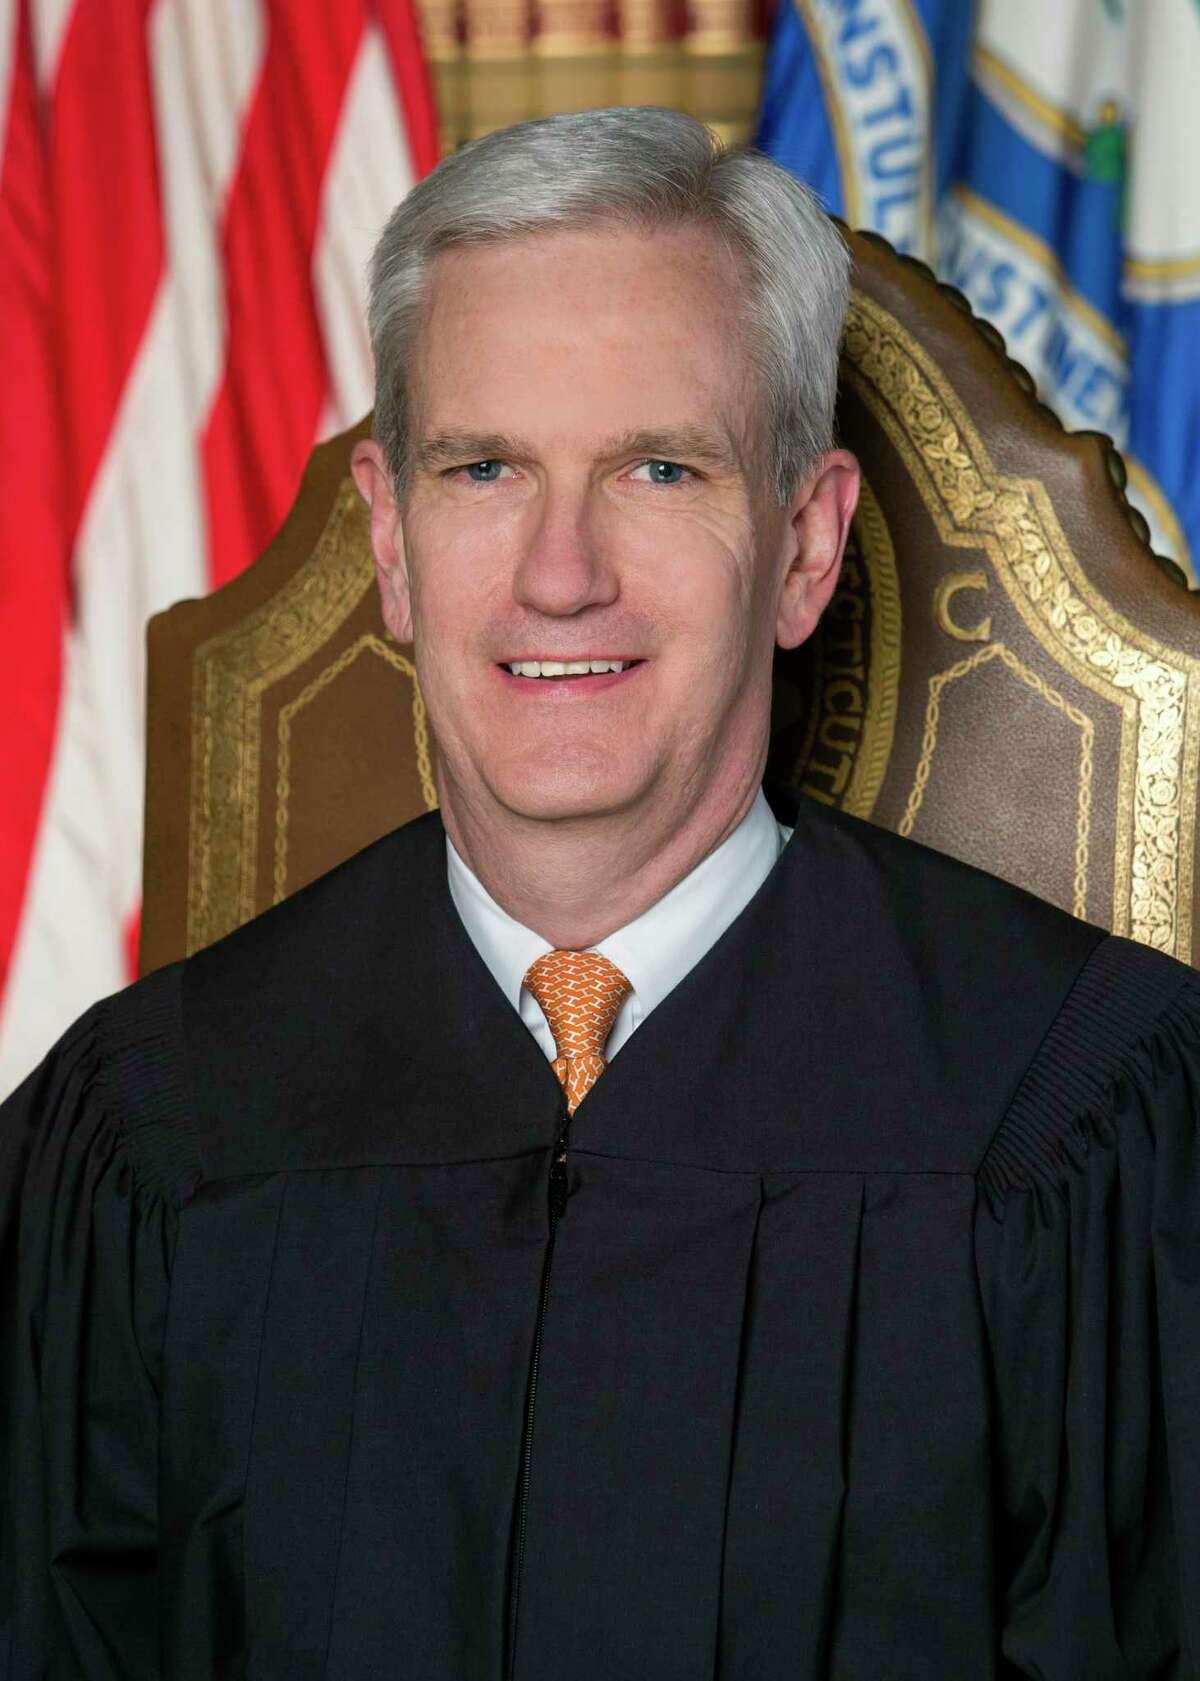 Supreme Court Associate Justice Andrew J. McDonald